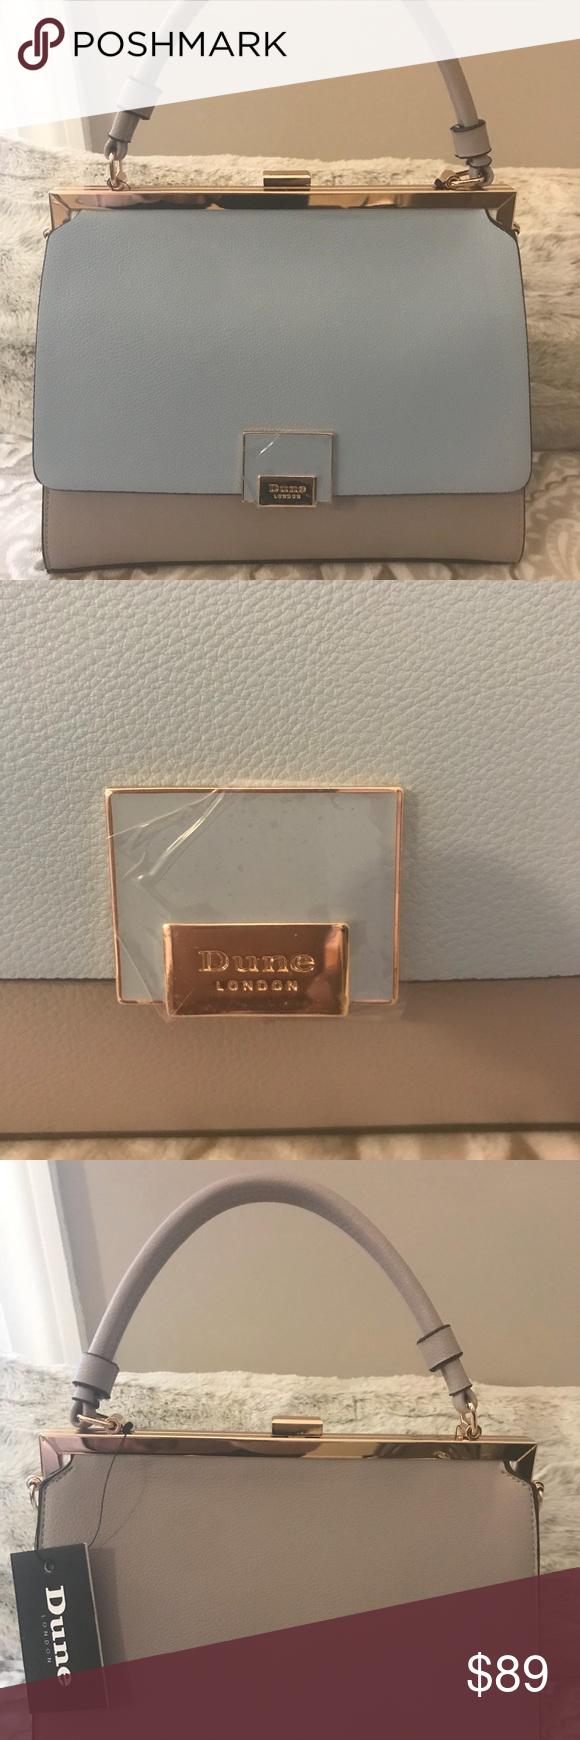 9dc279bf7b59 🆕Dune London Mini Satchel Crossbody Bag 💼 Brand🆕 Dune London Mini  Satchel